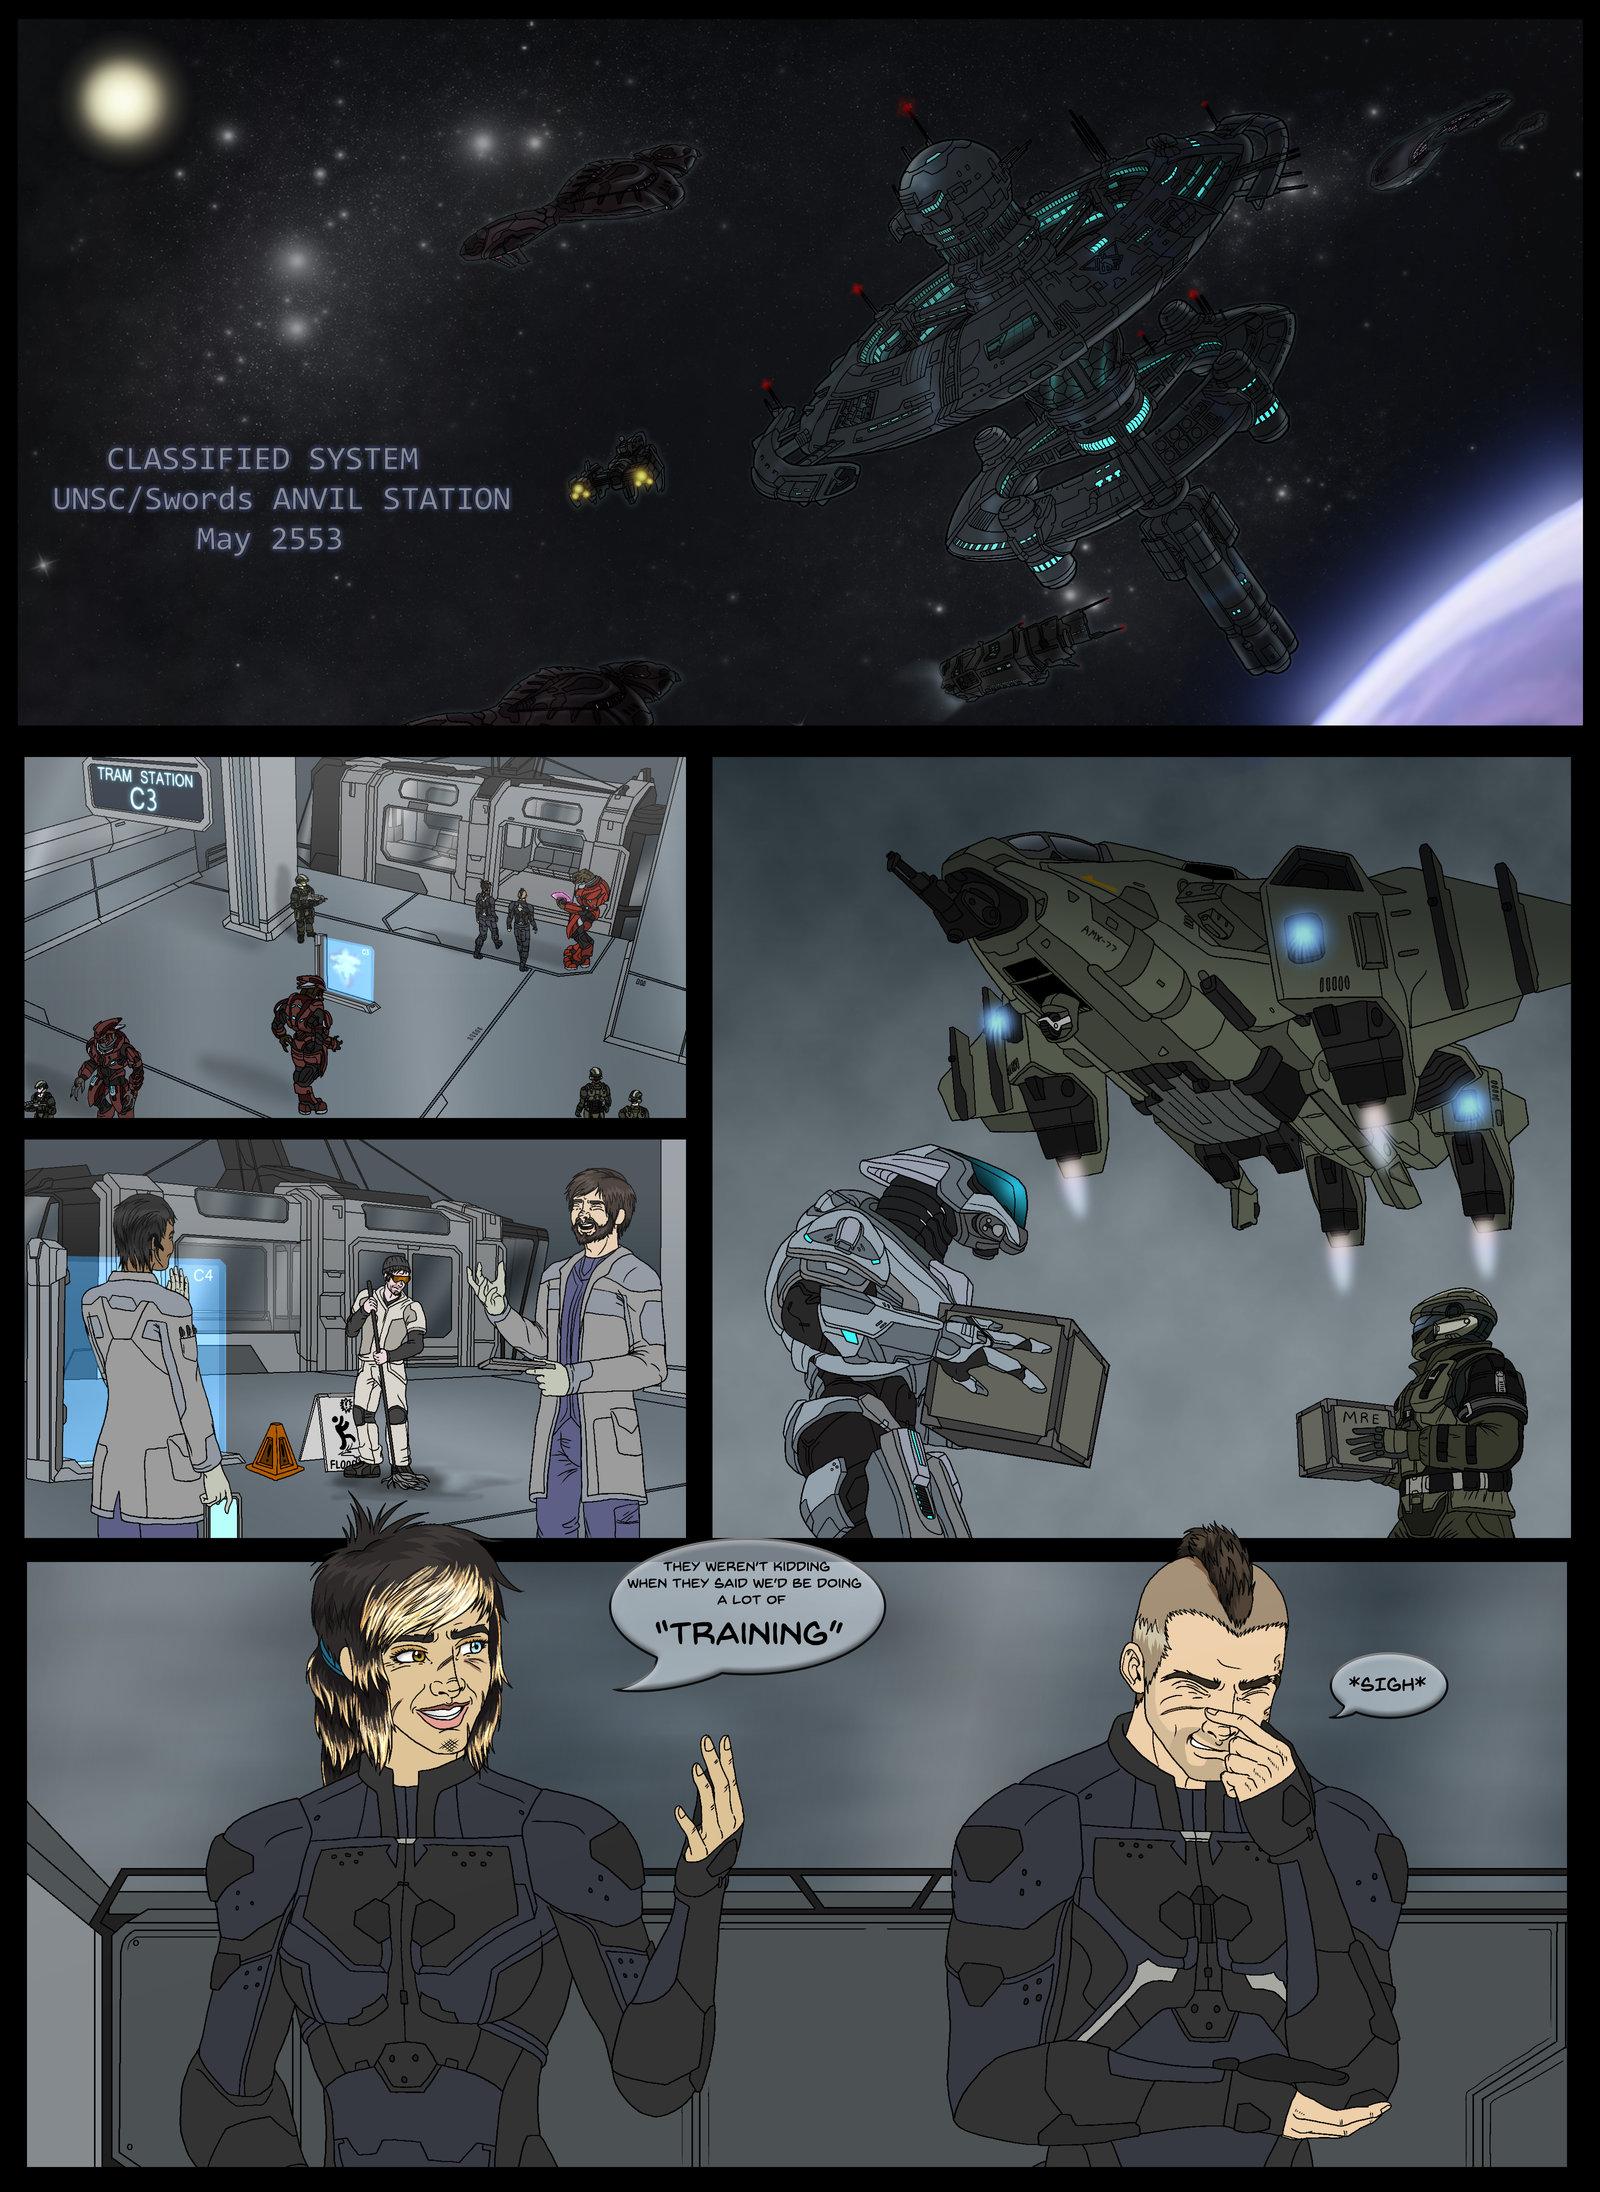 Halo Ammunition: ANVIL Initiative Pg 2 by Halochief89 on